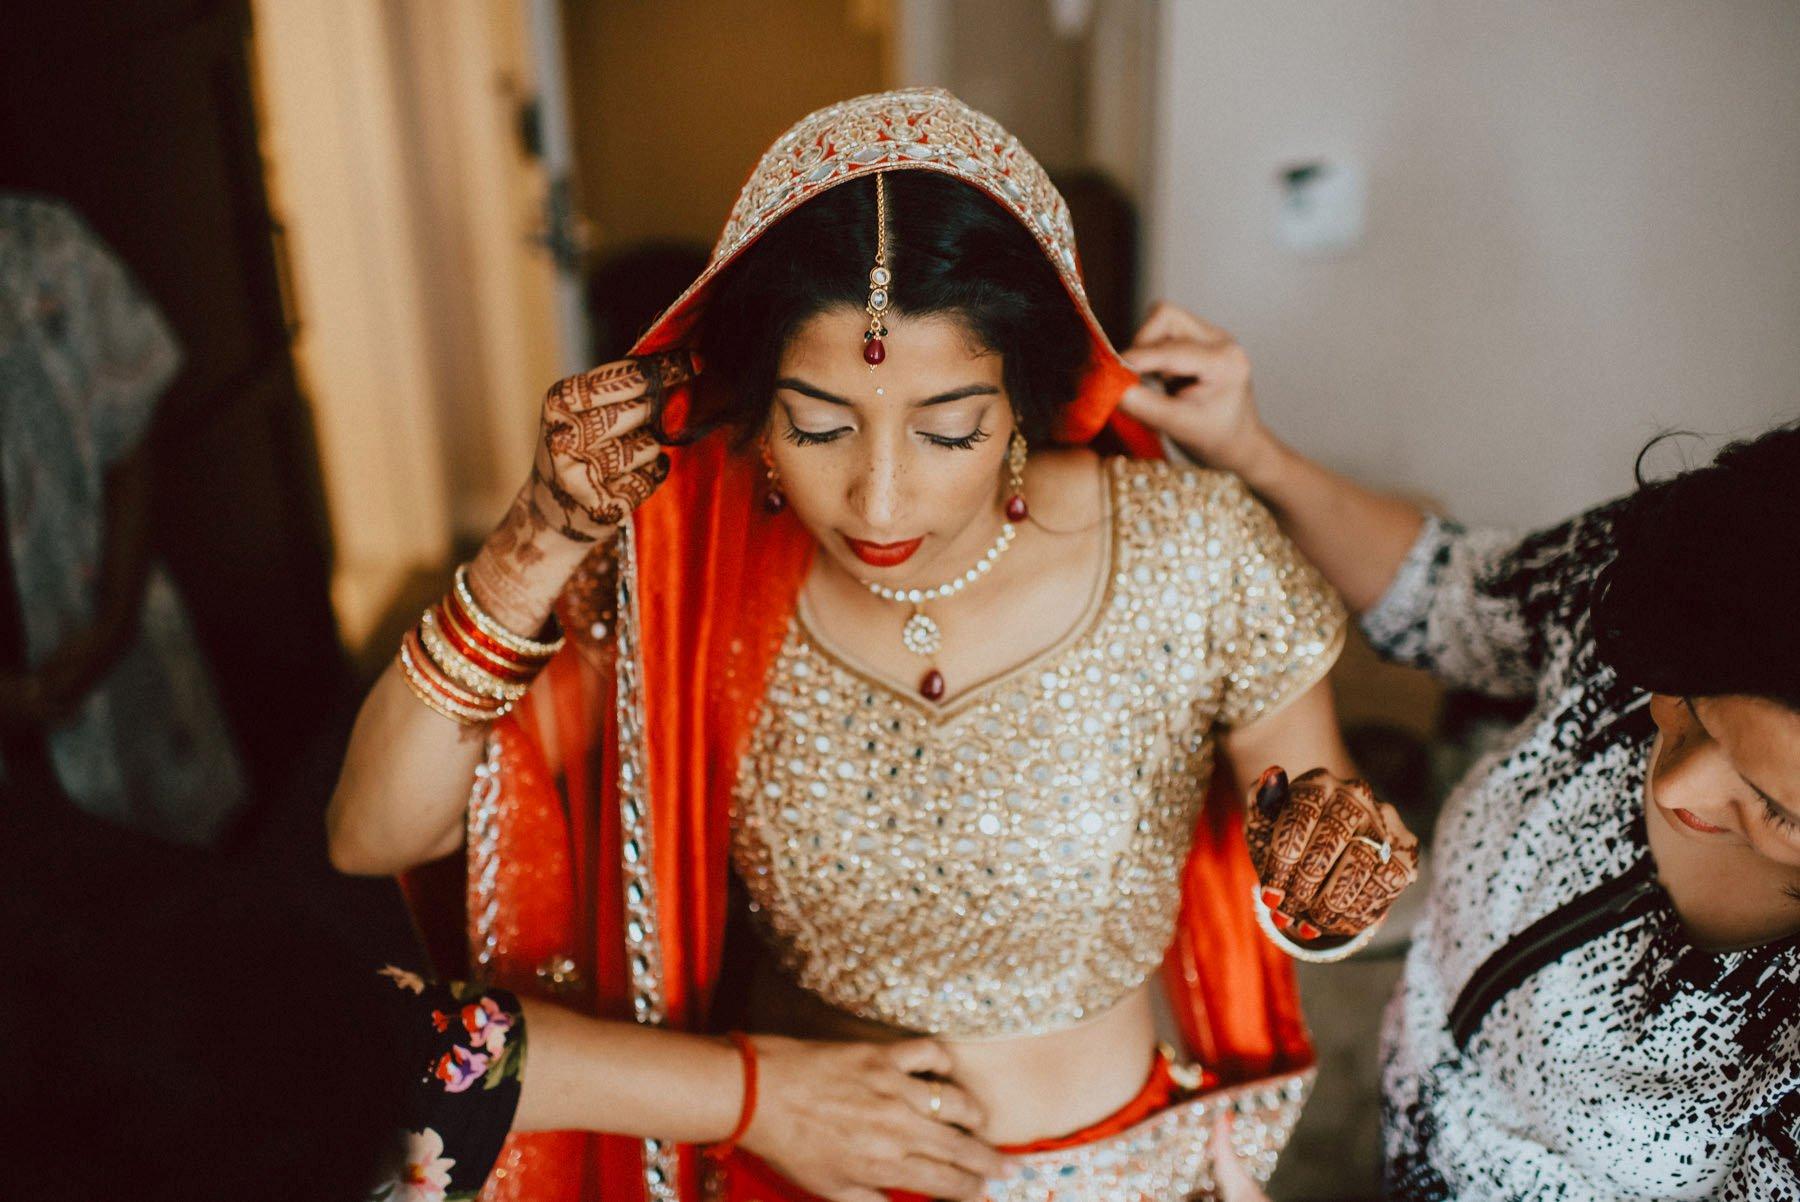 vie-philadelphia-indian-wedding-21.jpg